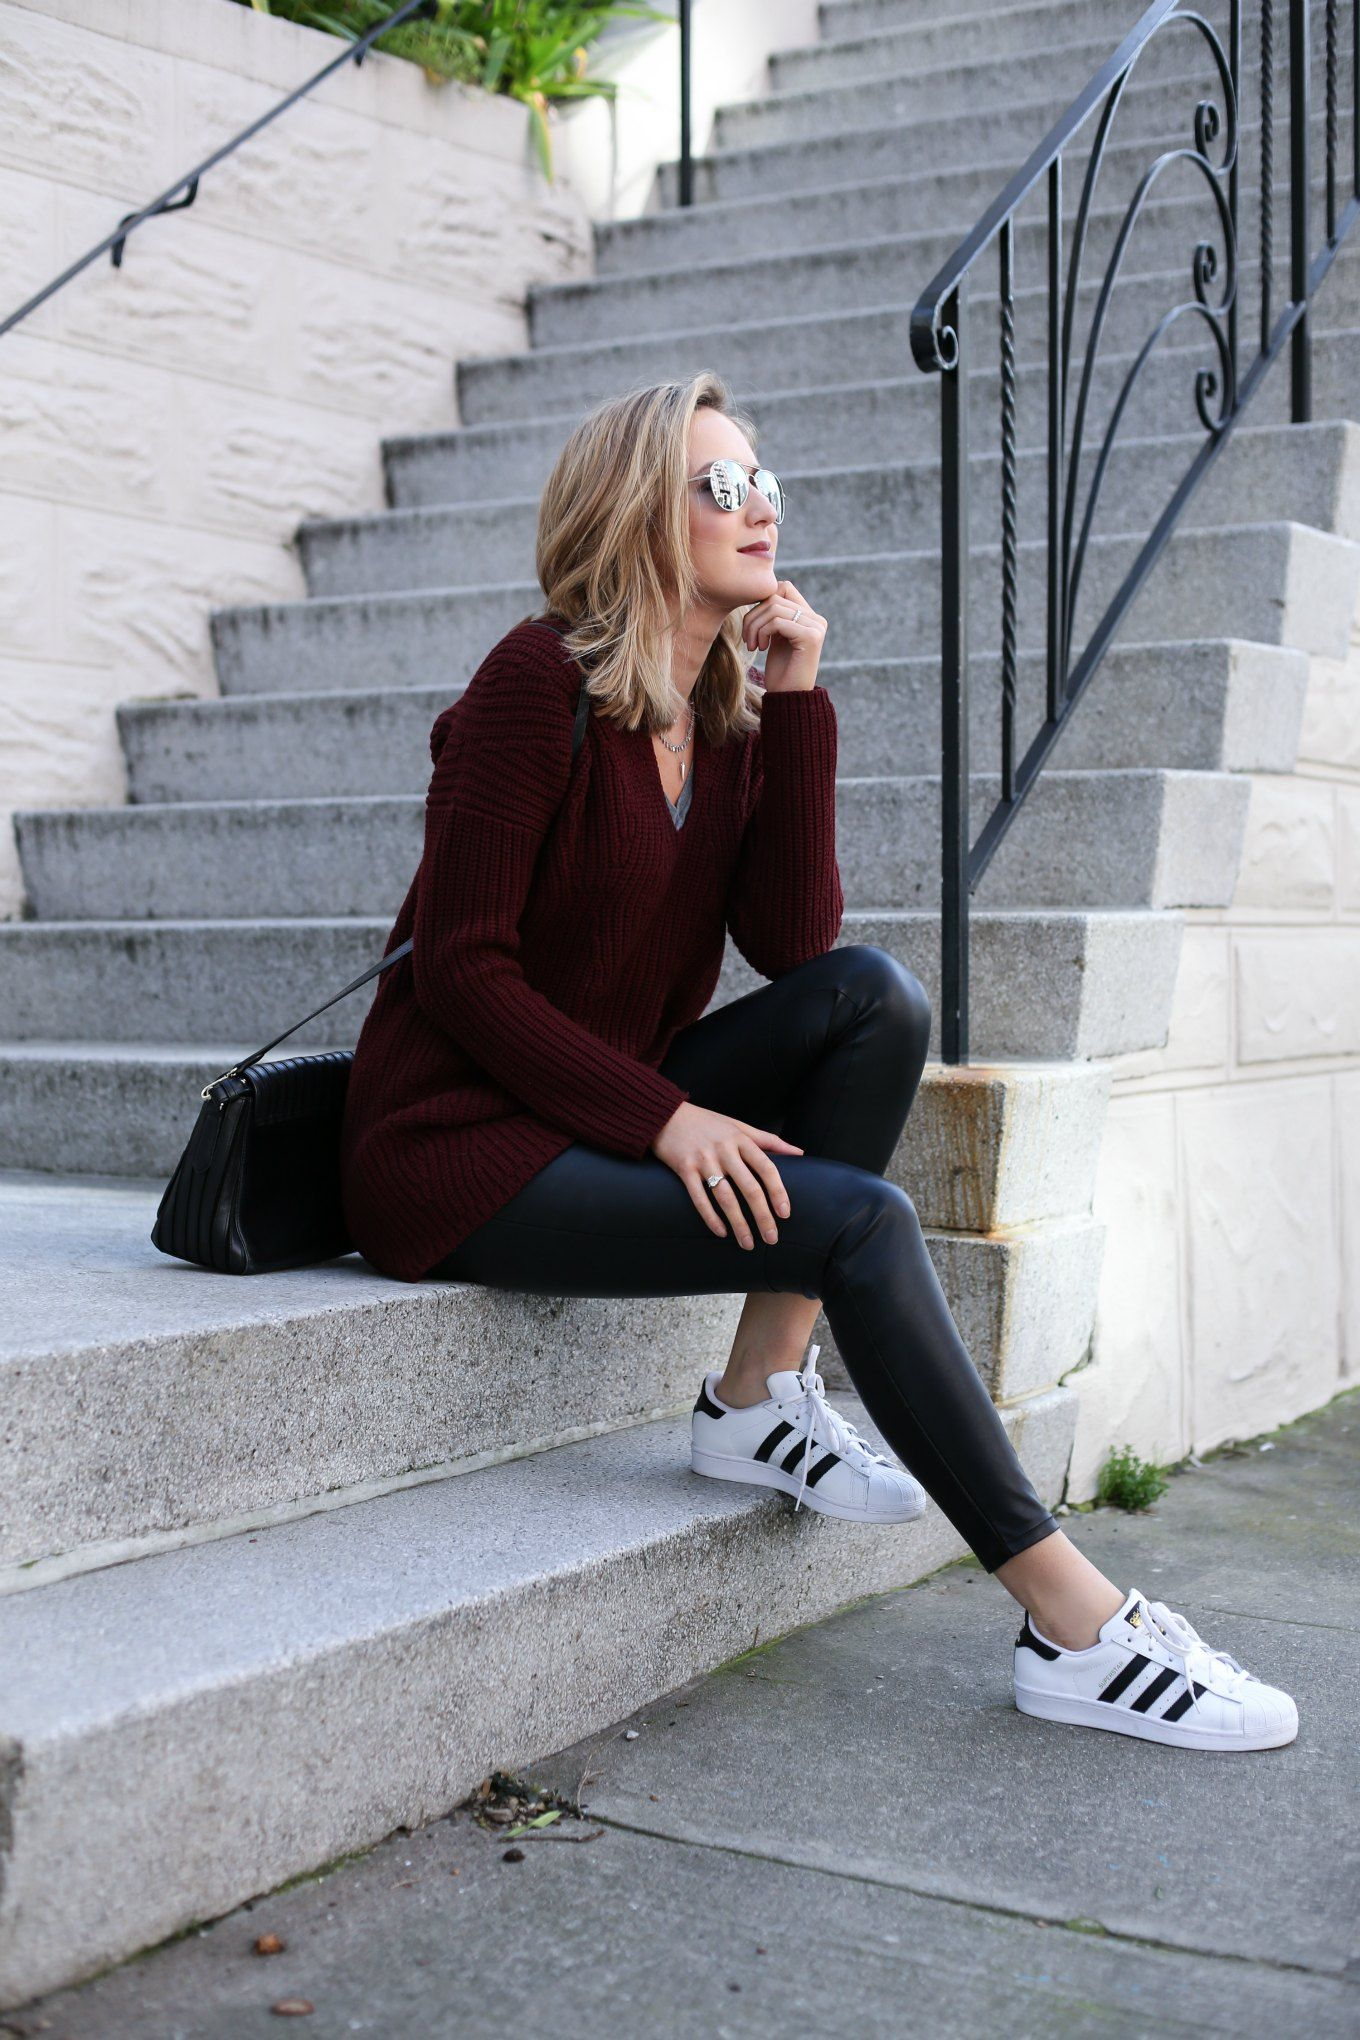 67dafa54a3a87 Chunky Sweater + Leather Leggings - MEMORANDUM, formerly The Classy  CubicleMEMORANDUM, formerly The Classy Cubicle